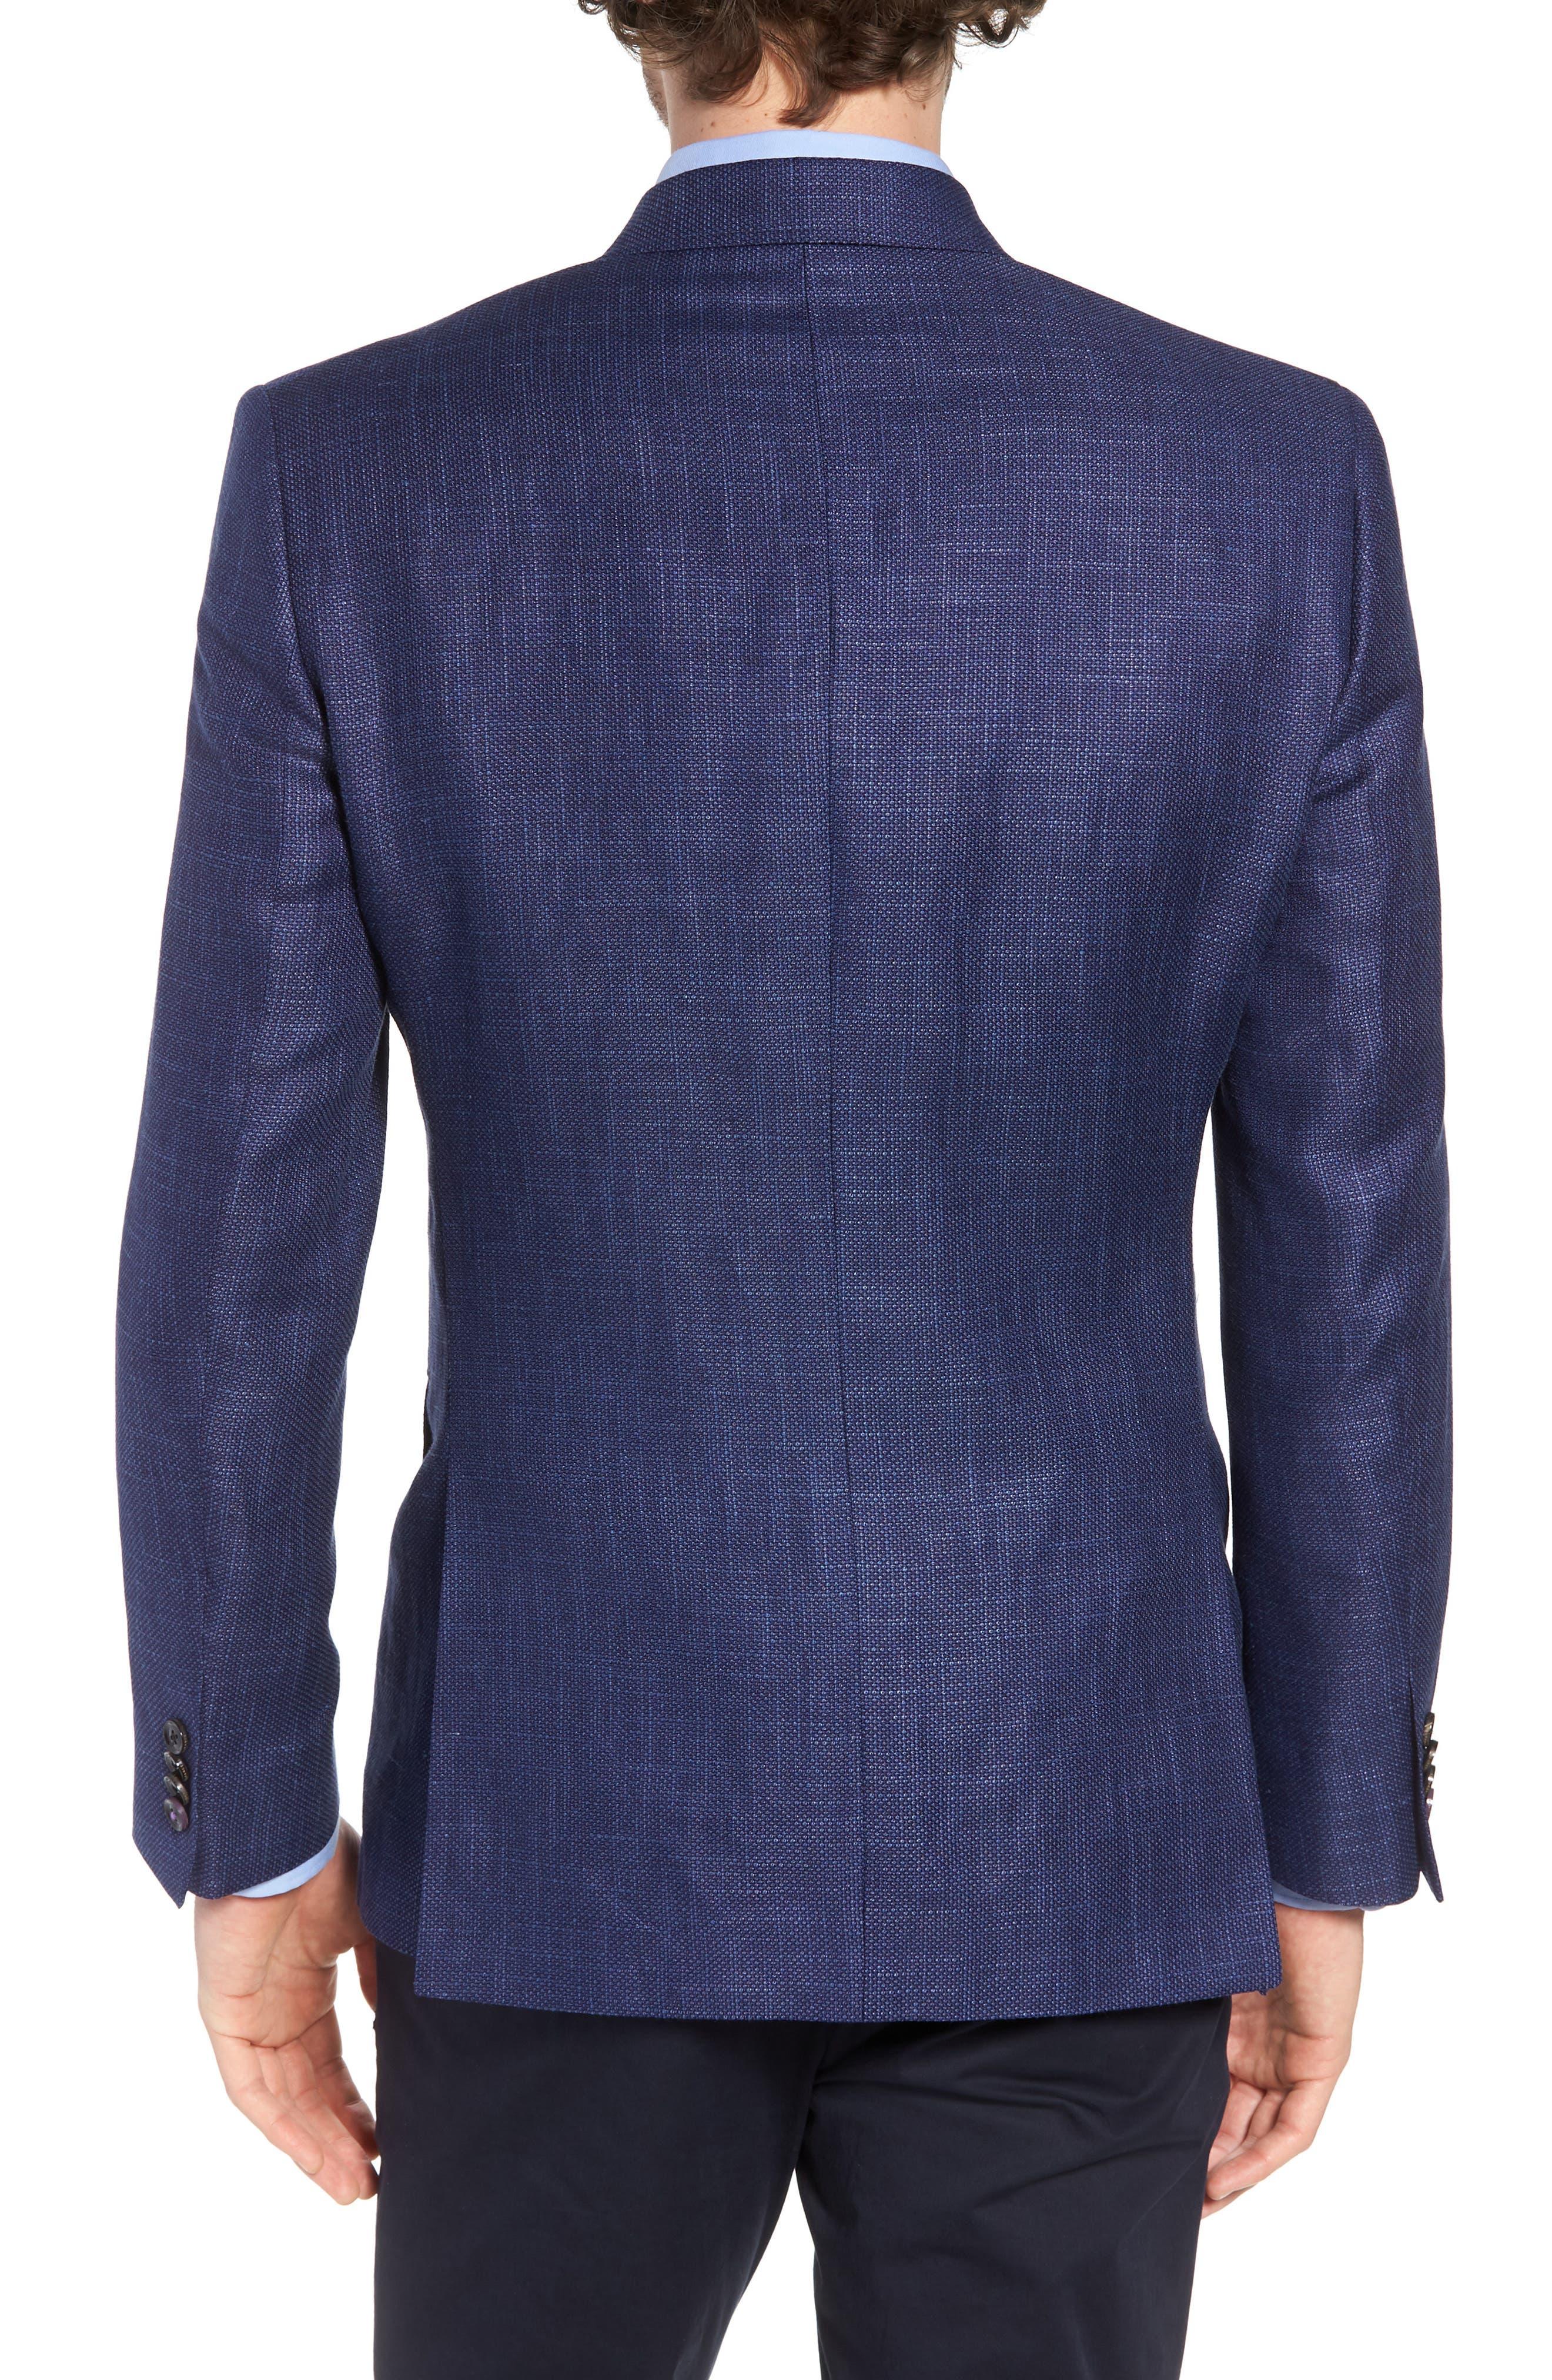 Jay Trim Fit Linen & Wool Blazer,                             Alternate thumbnail 2, color,                             Blue